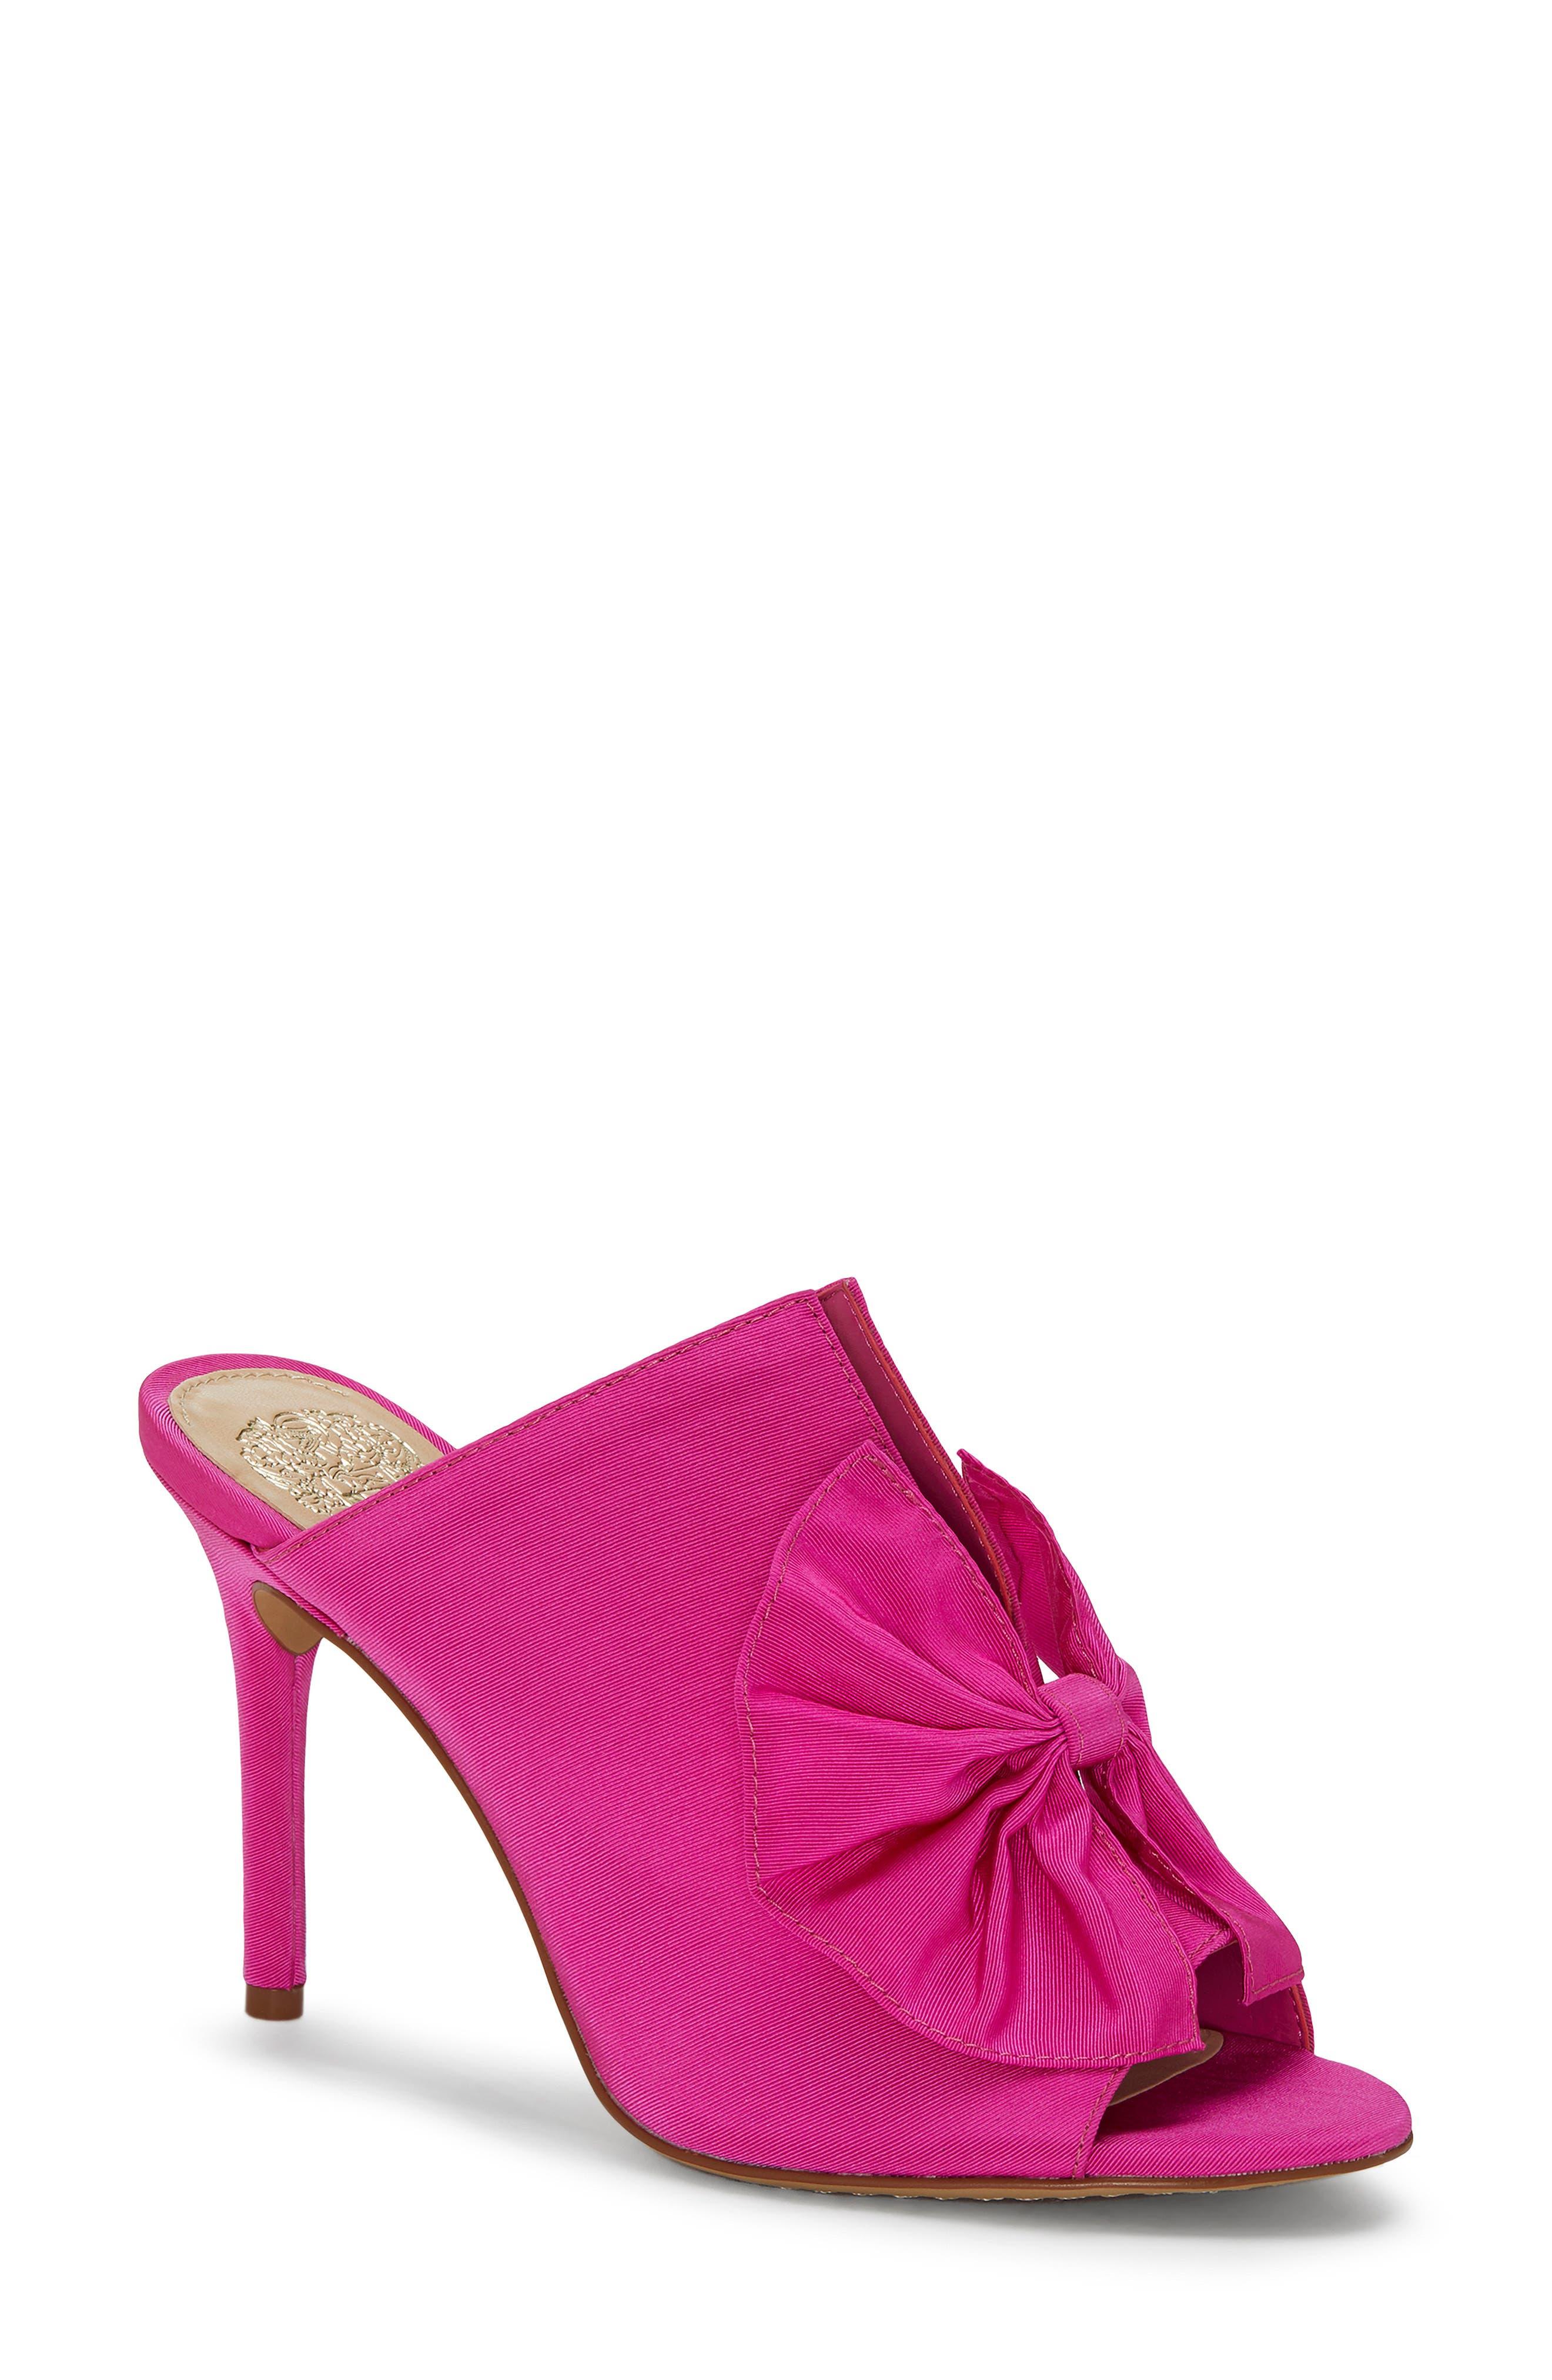 Vince Camuto Cachita Sandal- Pink